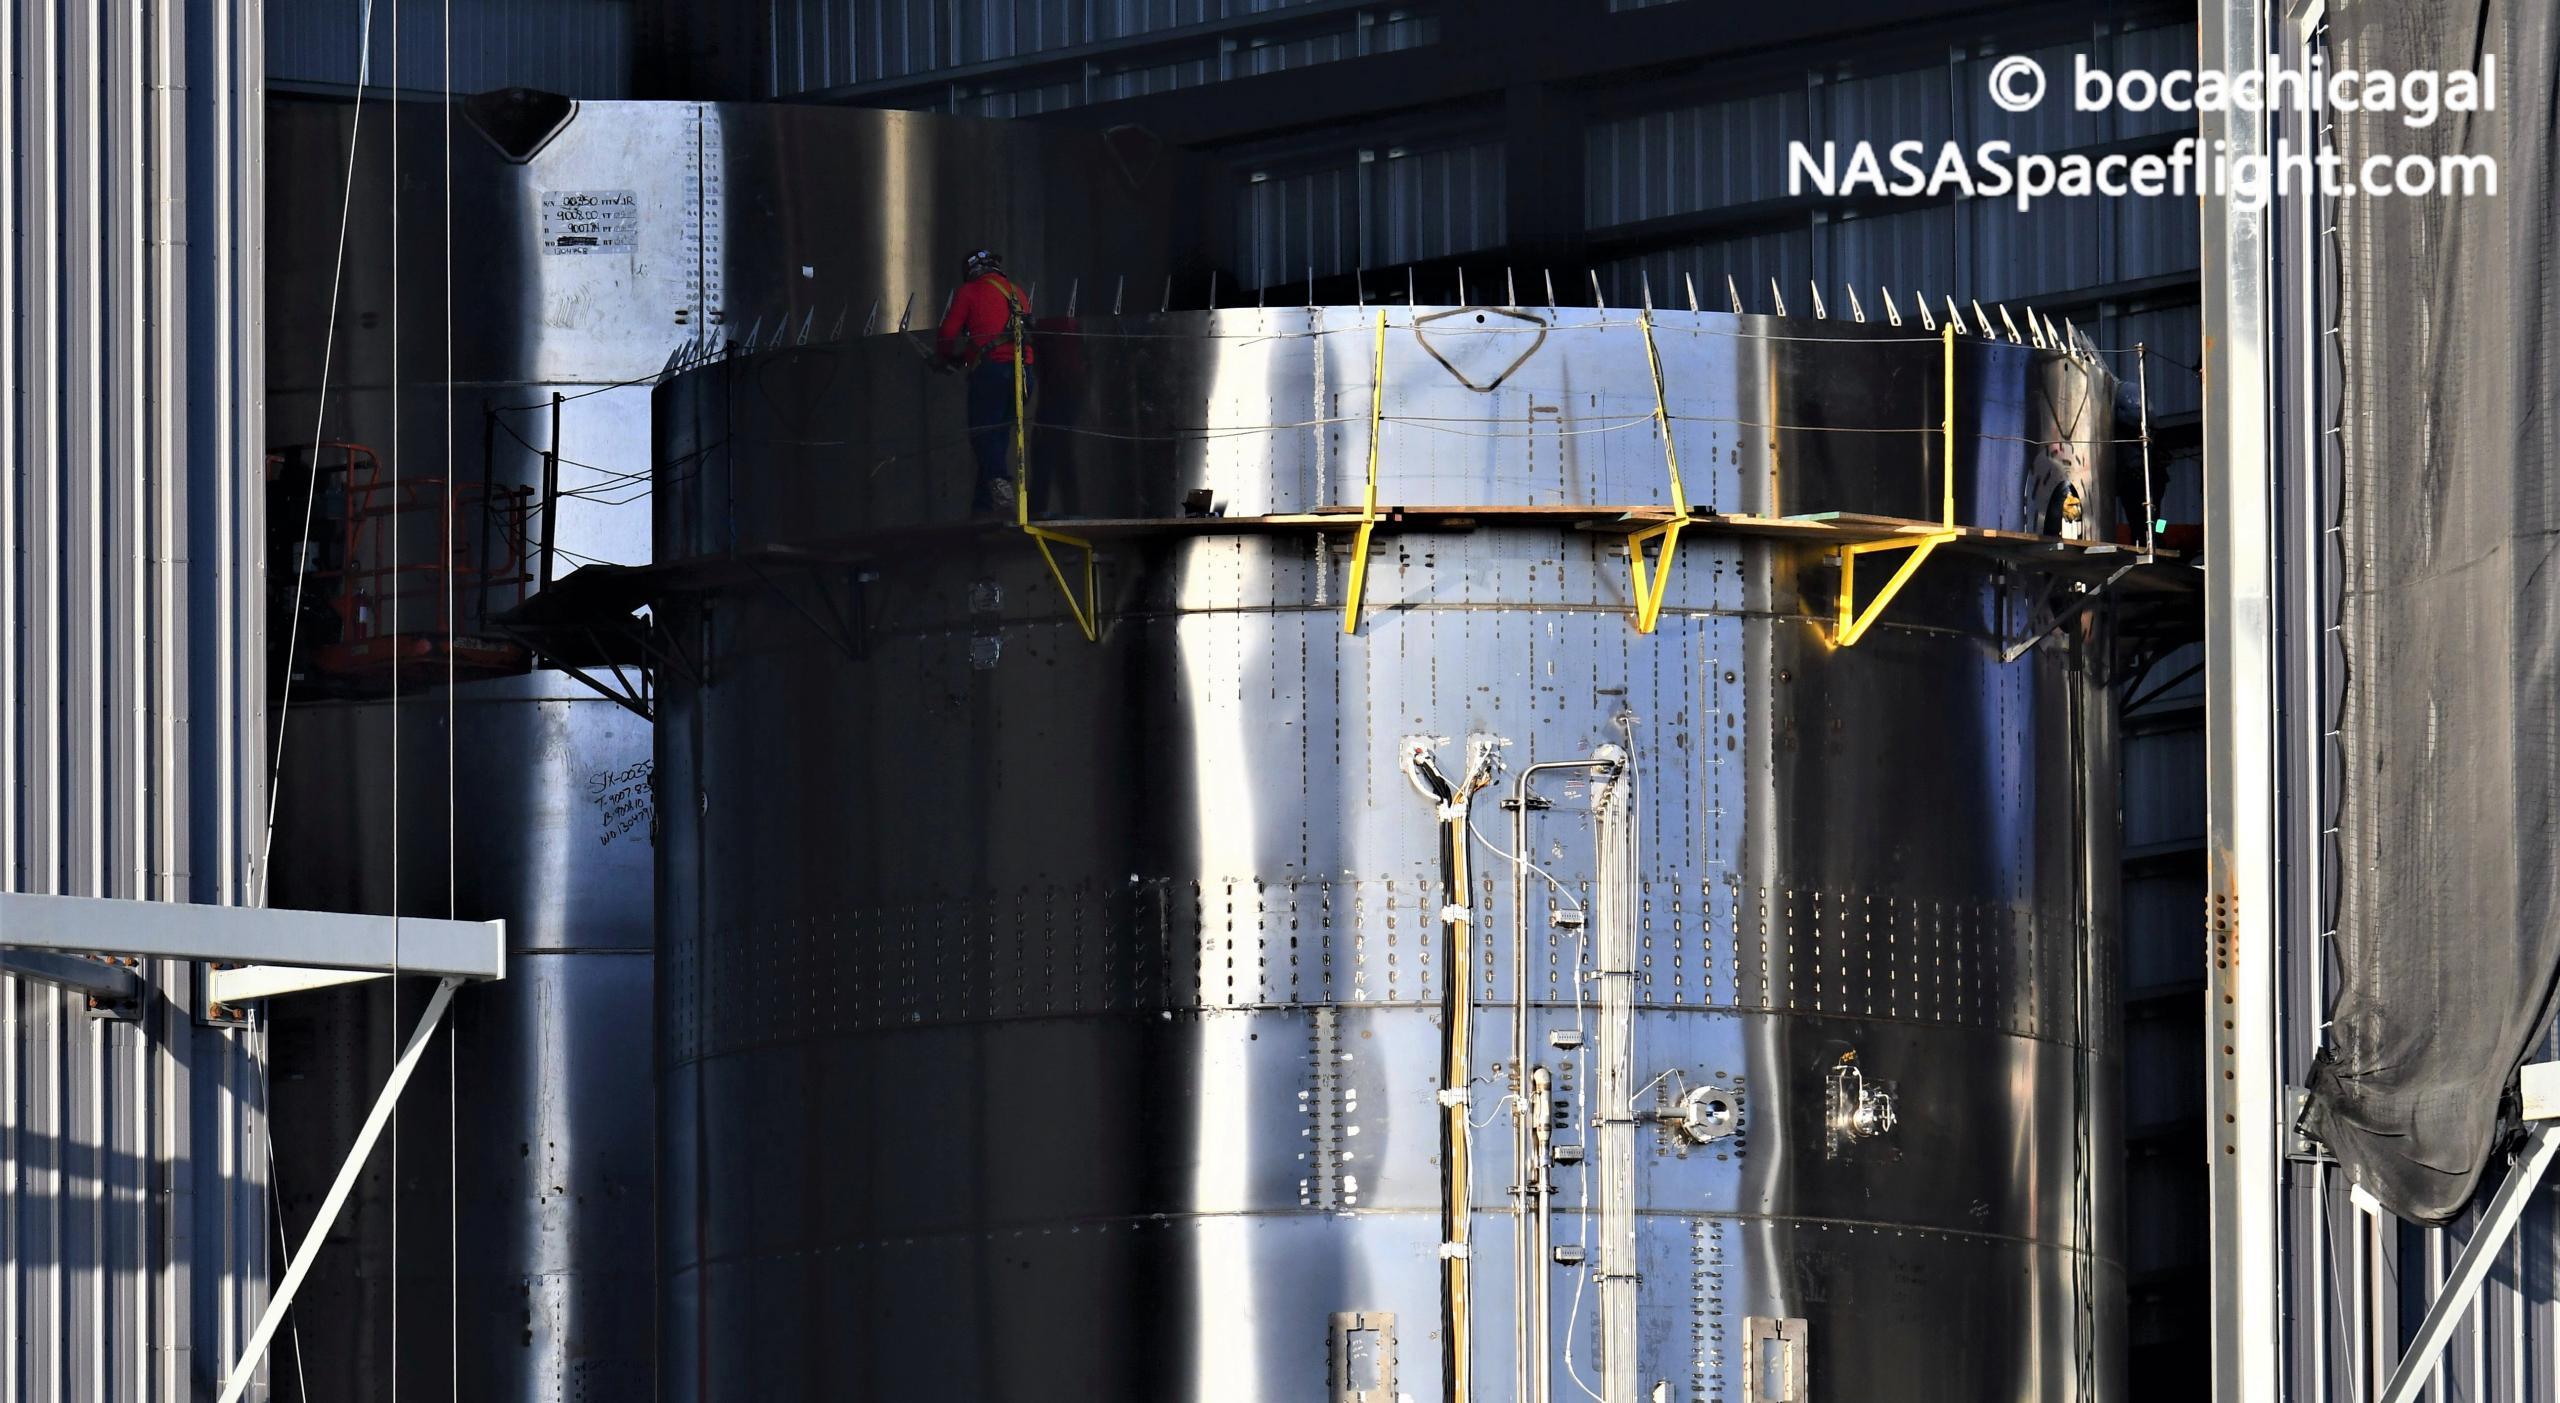 Starship Boca Chica 020721 (NASASpaceflight – bocachicagal) SN11 nose install + BN1 2 crop (c)